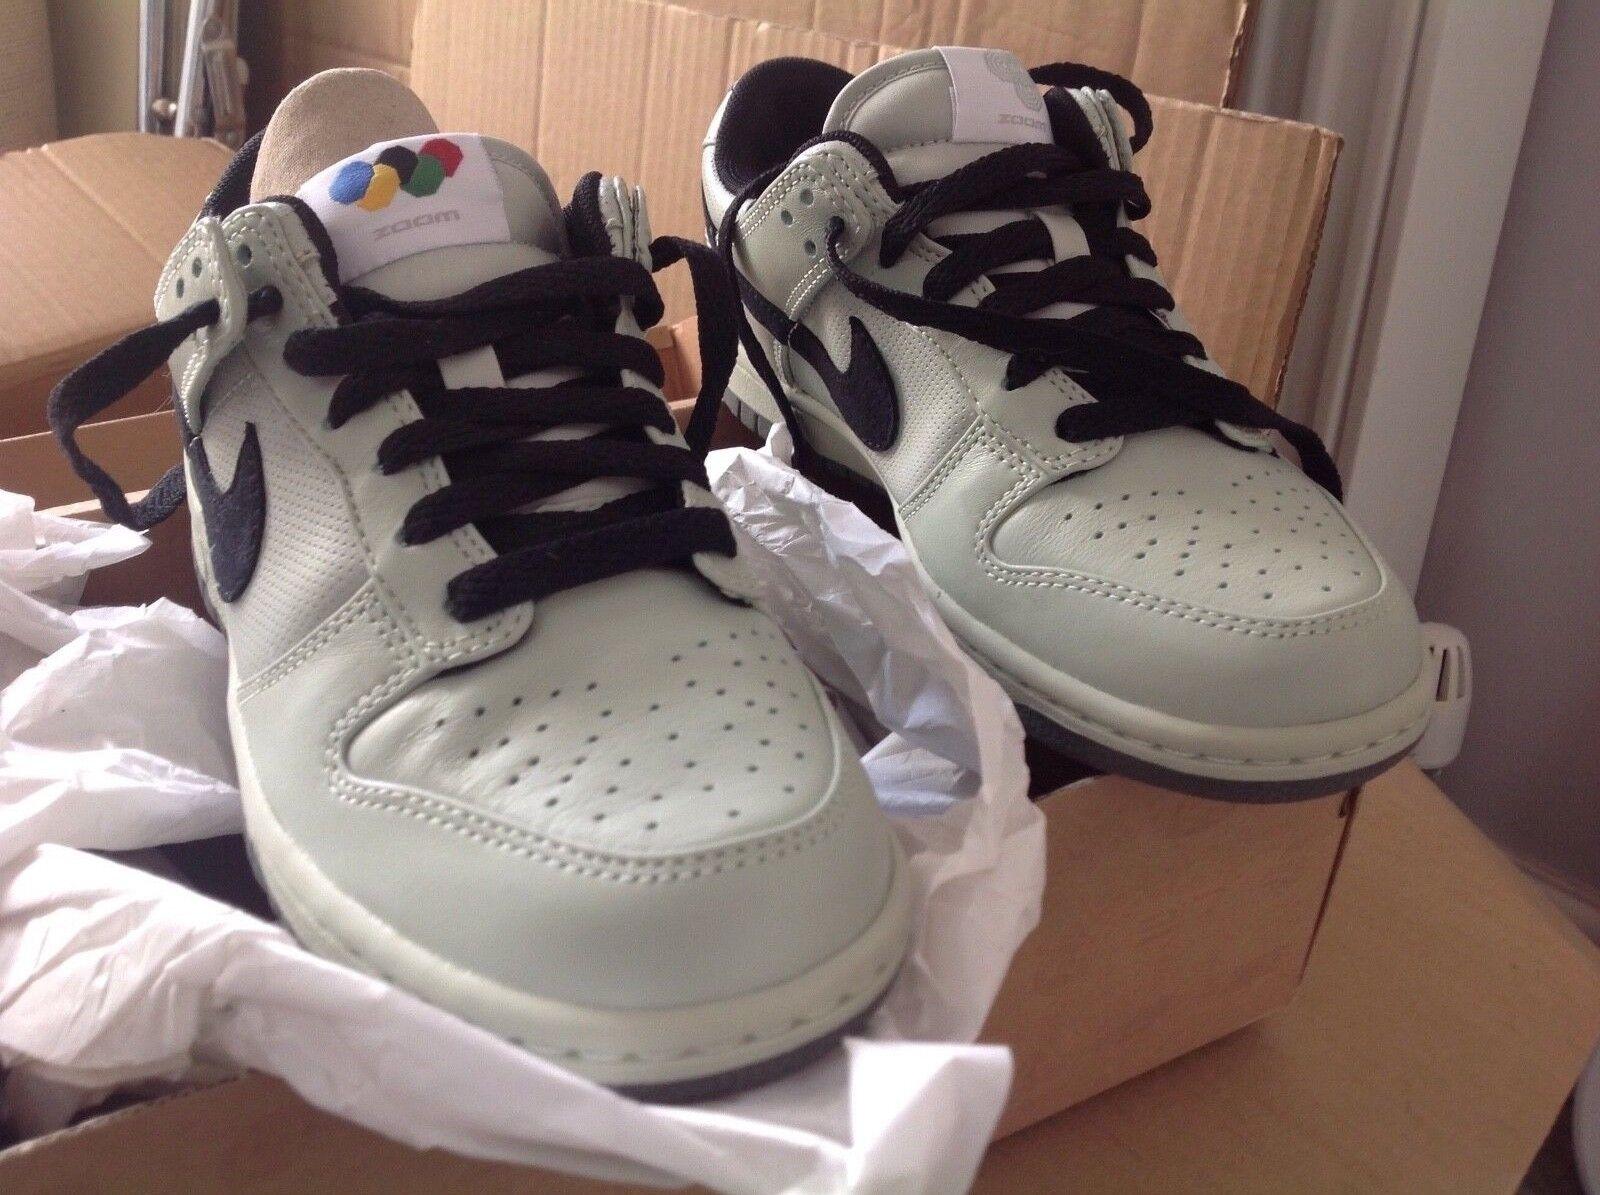 Nike dunk 3, low premium Damens's trainers uk 3, dunk greeny Grau- new 67f054